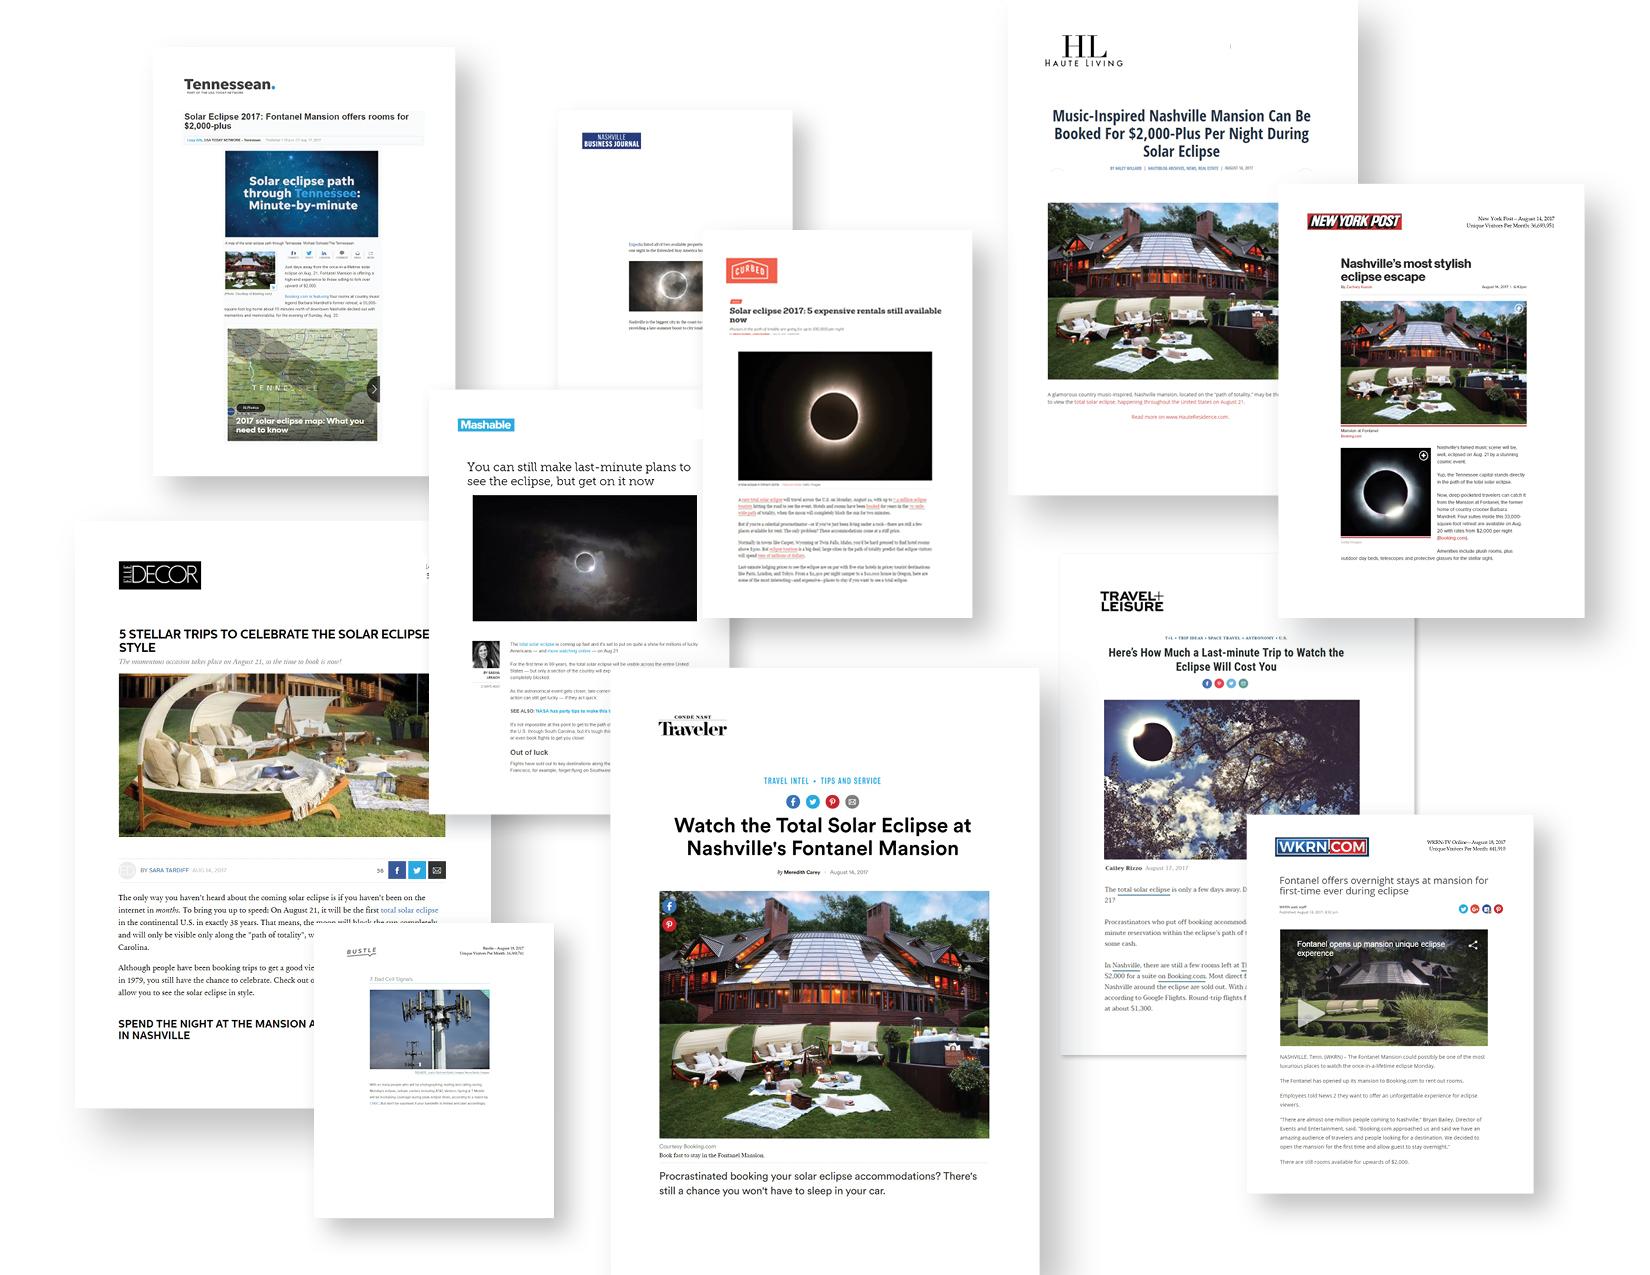 Eclipse Press Release.jpg